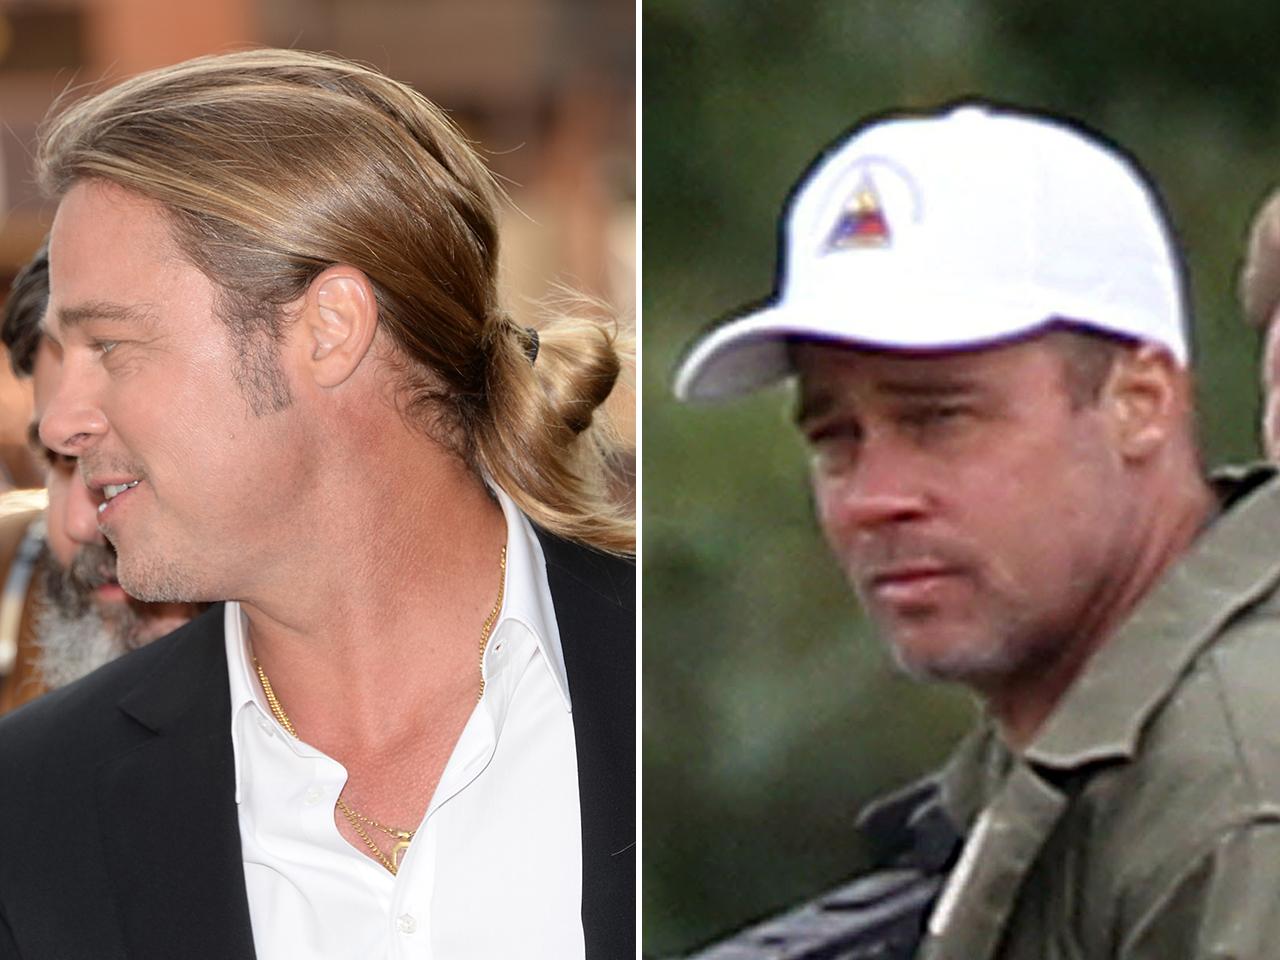 Long Story Short Brad Pitt Cuts Off All His Hair Again